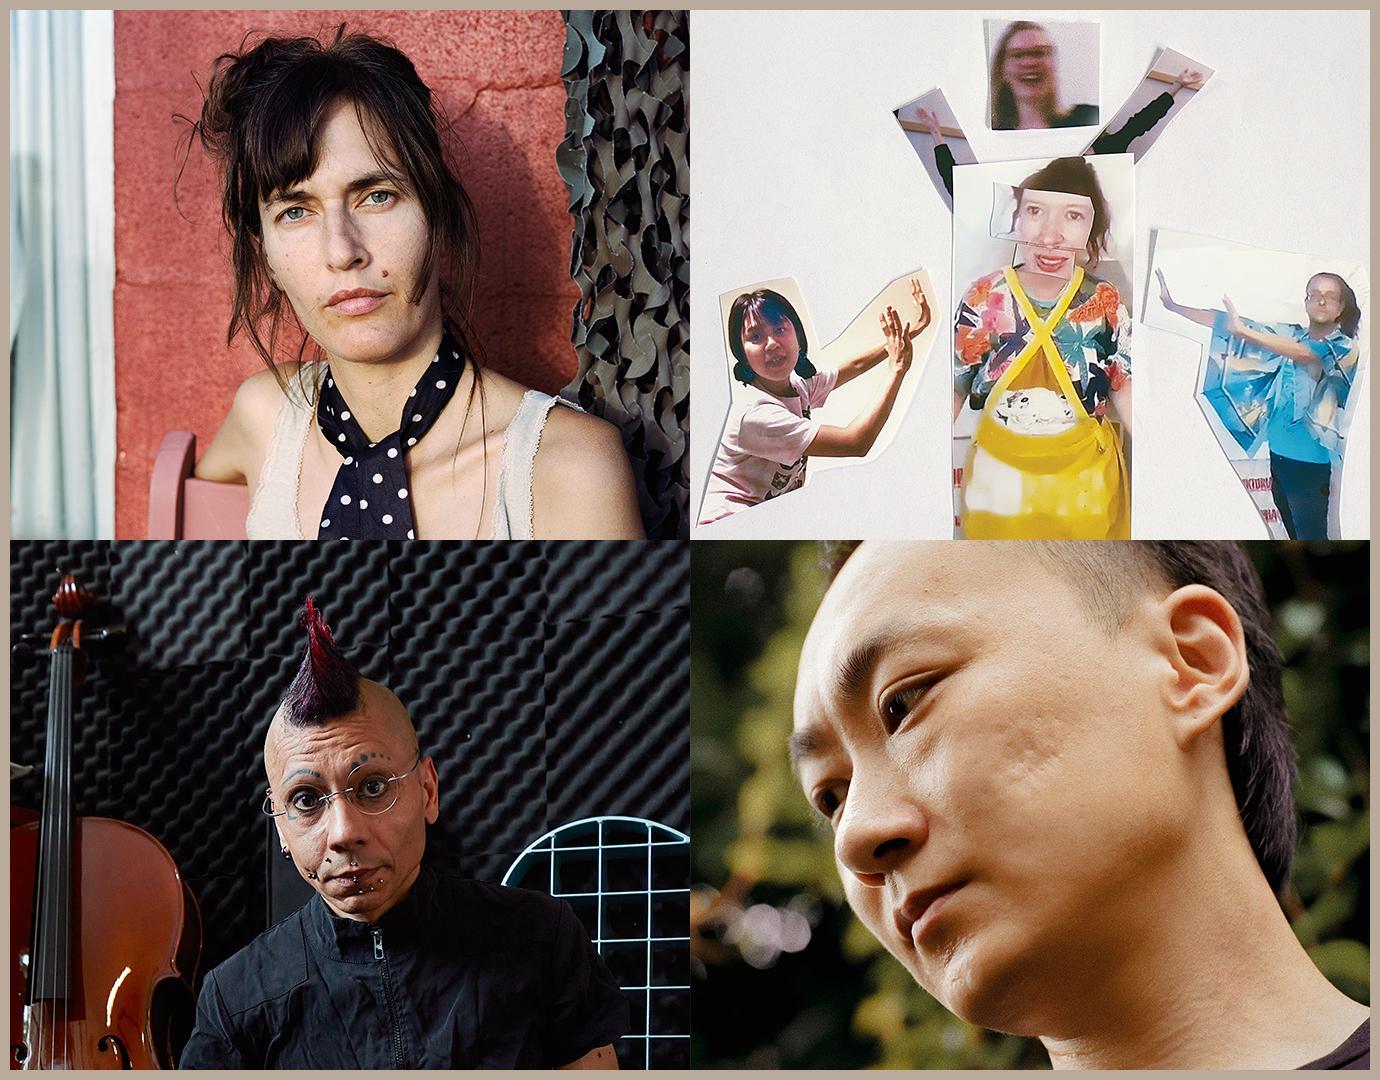 Clockwise from top left: Josephine Foster by André Cepeda; Alligator Gozaimasu (crop) by Heather Glazzard; Lao Dan of BBB & BBB by Li Hui; C-drík by Joseph Kadow